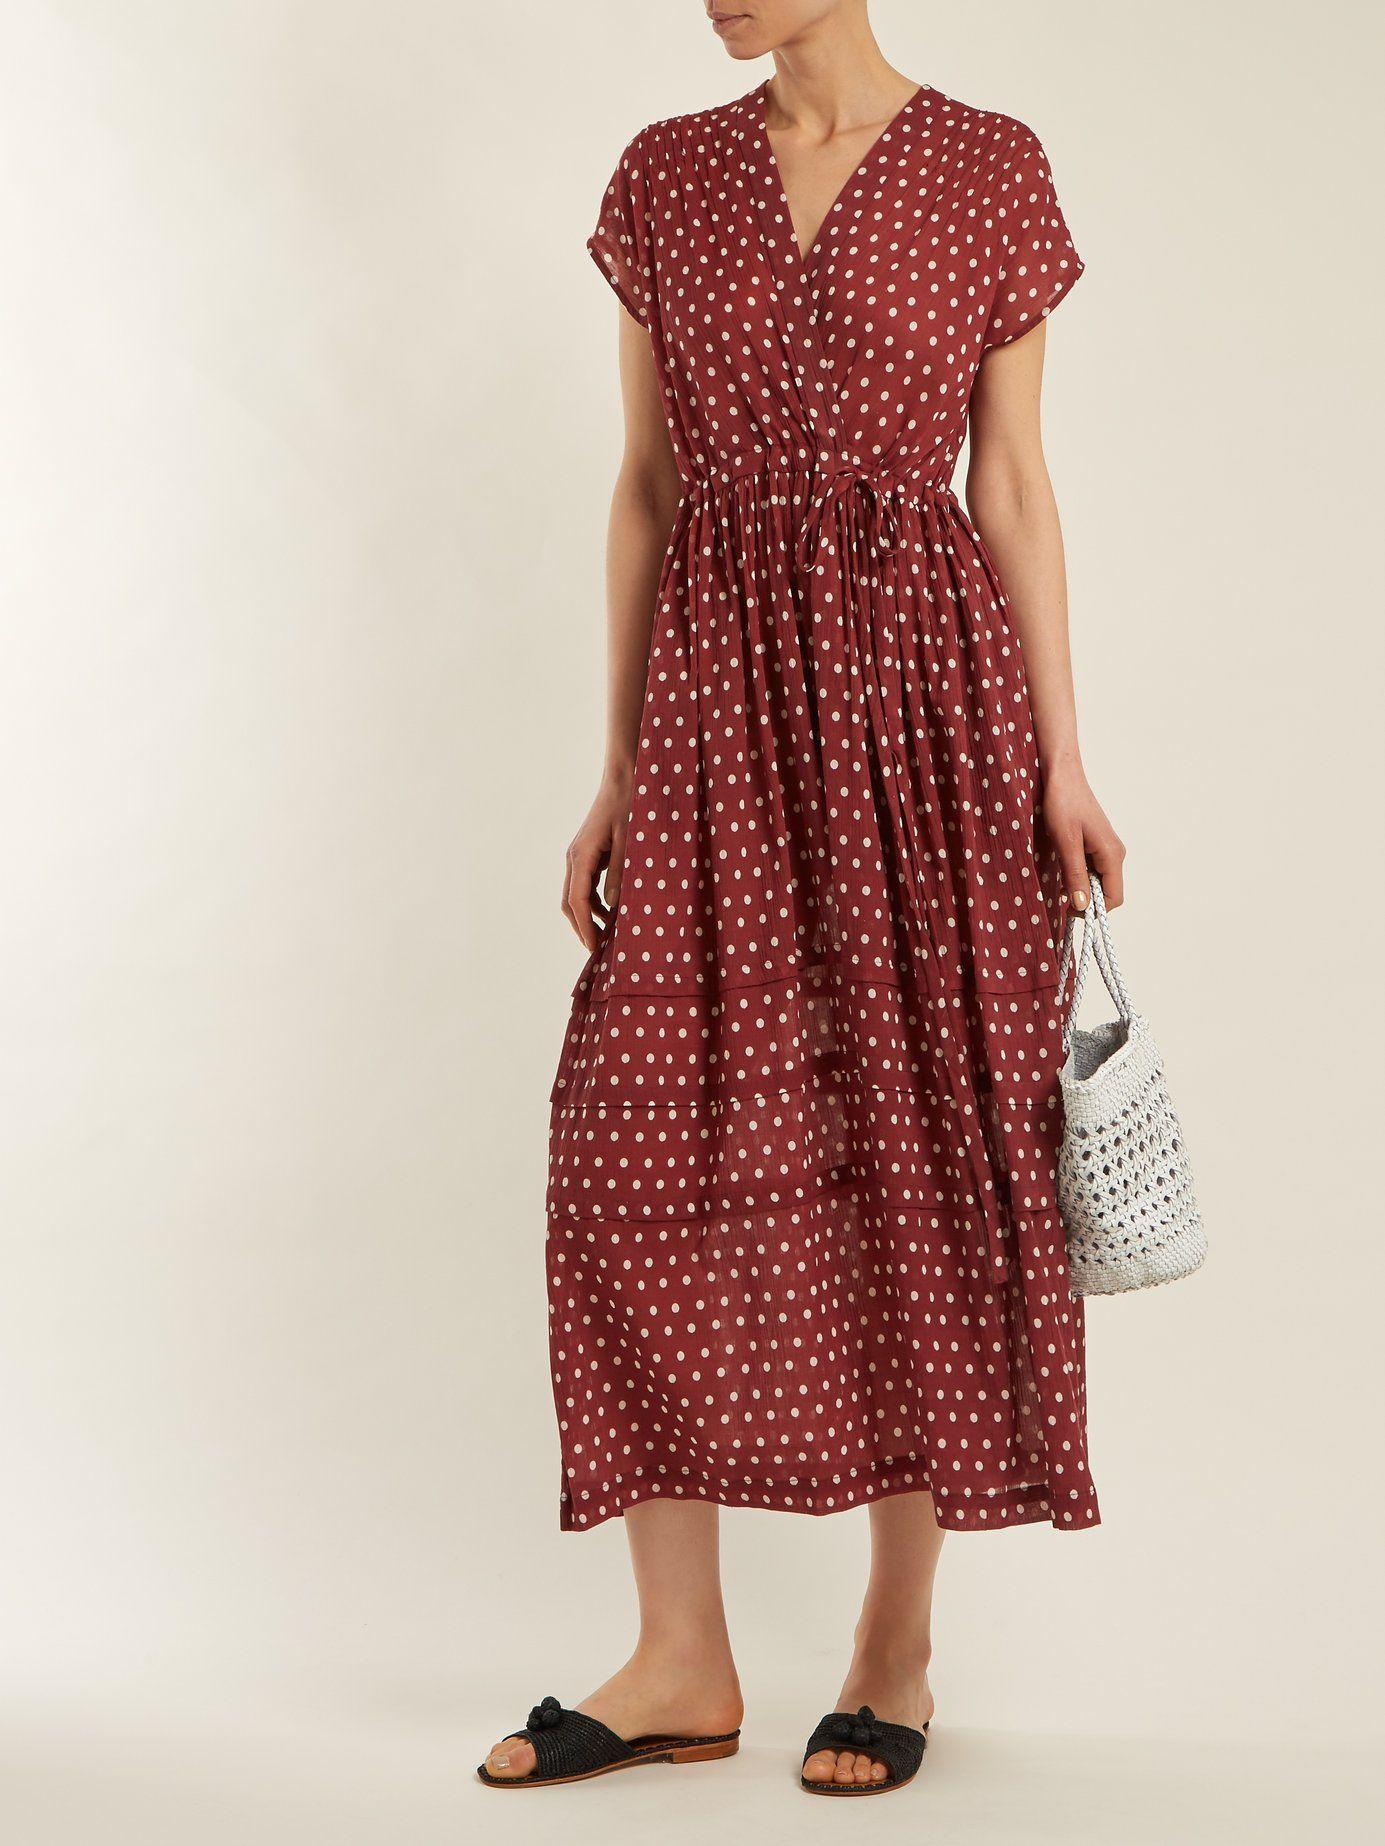 994ab9c25fd6e Maisee polka-dot dress